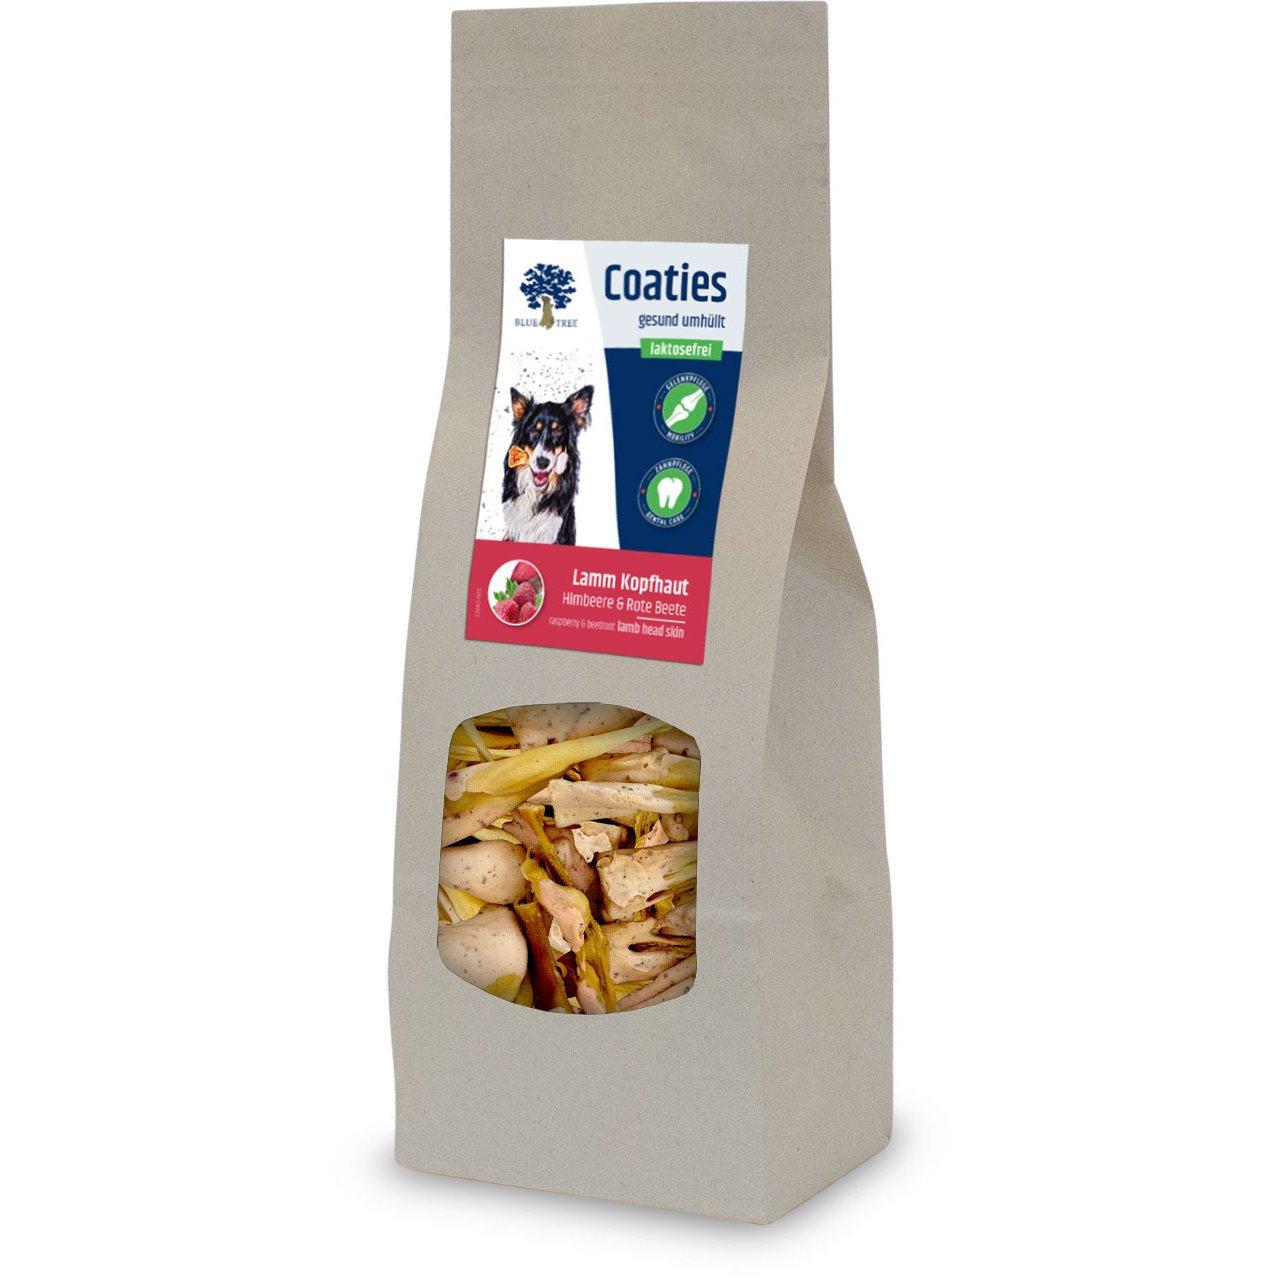 Blue Tree Coaties Hundekausnack mit laktosefreier Milch, Lamm Kopfhaut 70g